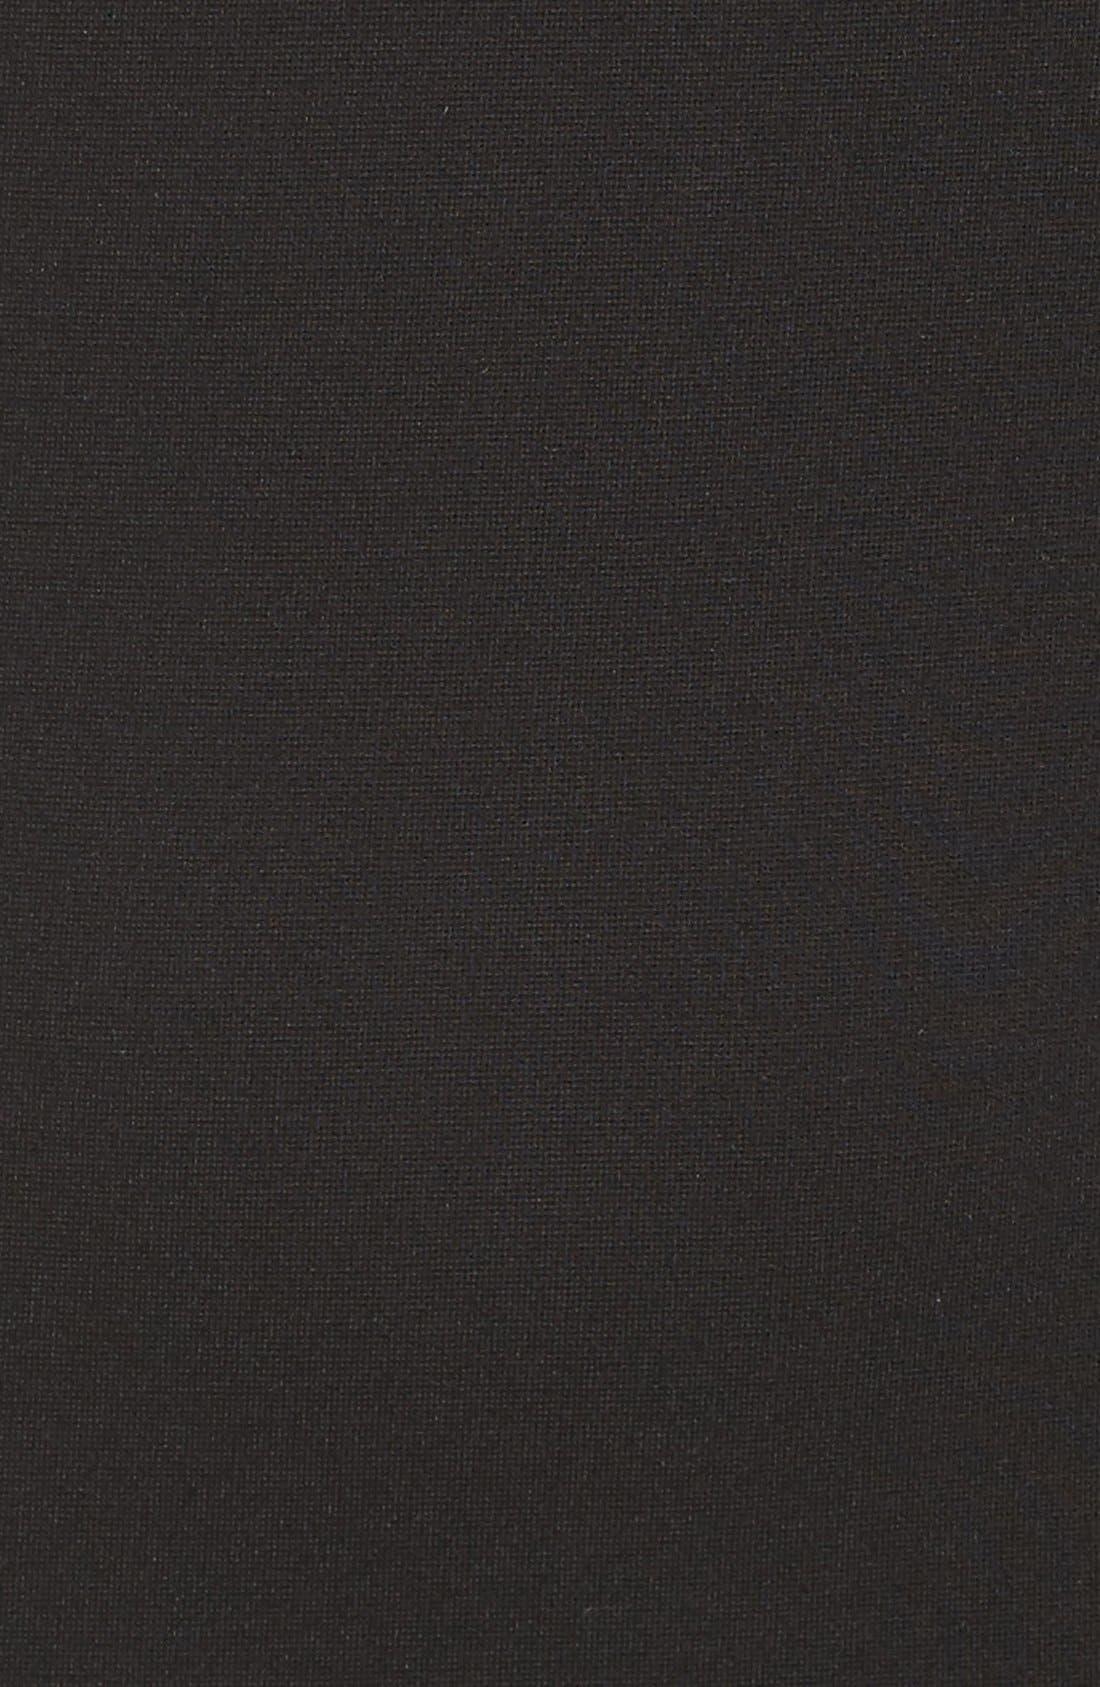 Alternate Image 5  - Felicity & Coco Shoulder Detail Ponte Sheath Dress (Regular & Petite) (Nordstrom Exclusive)